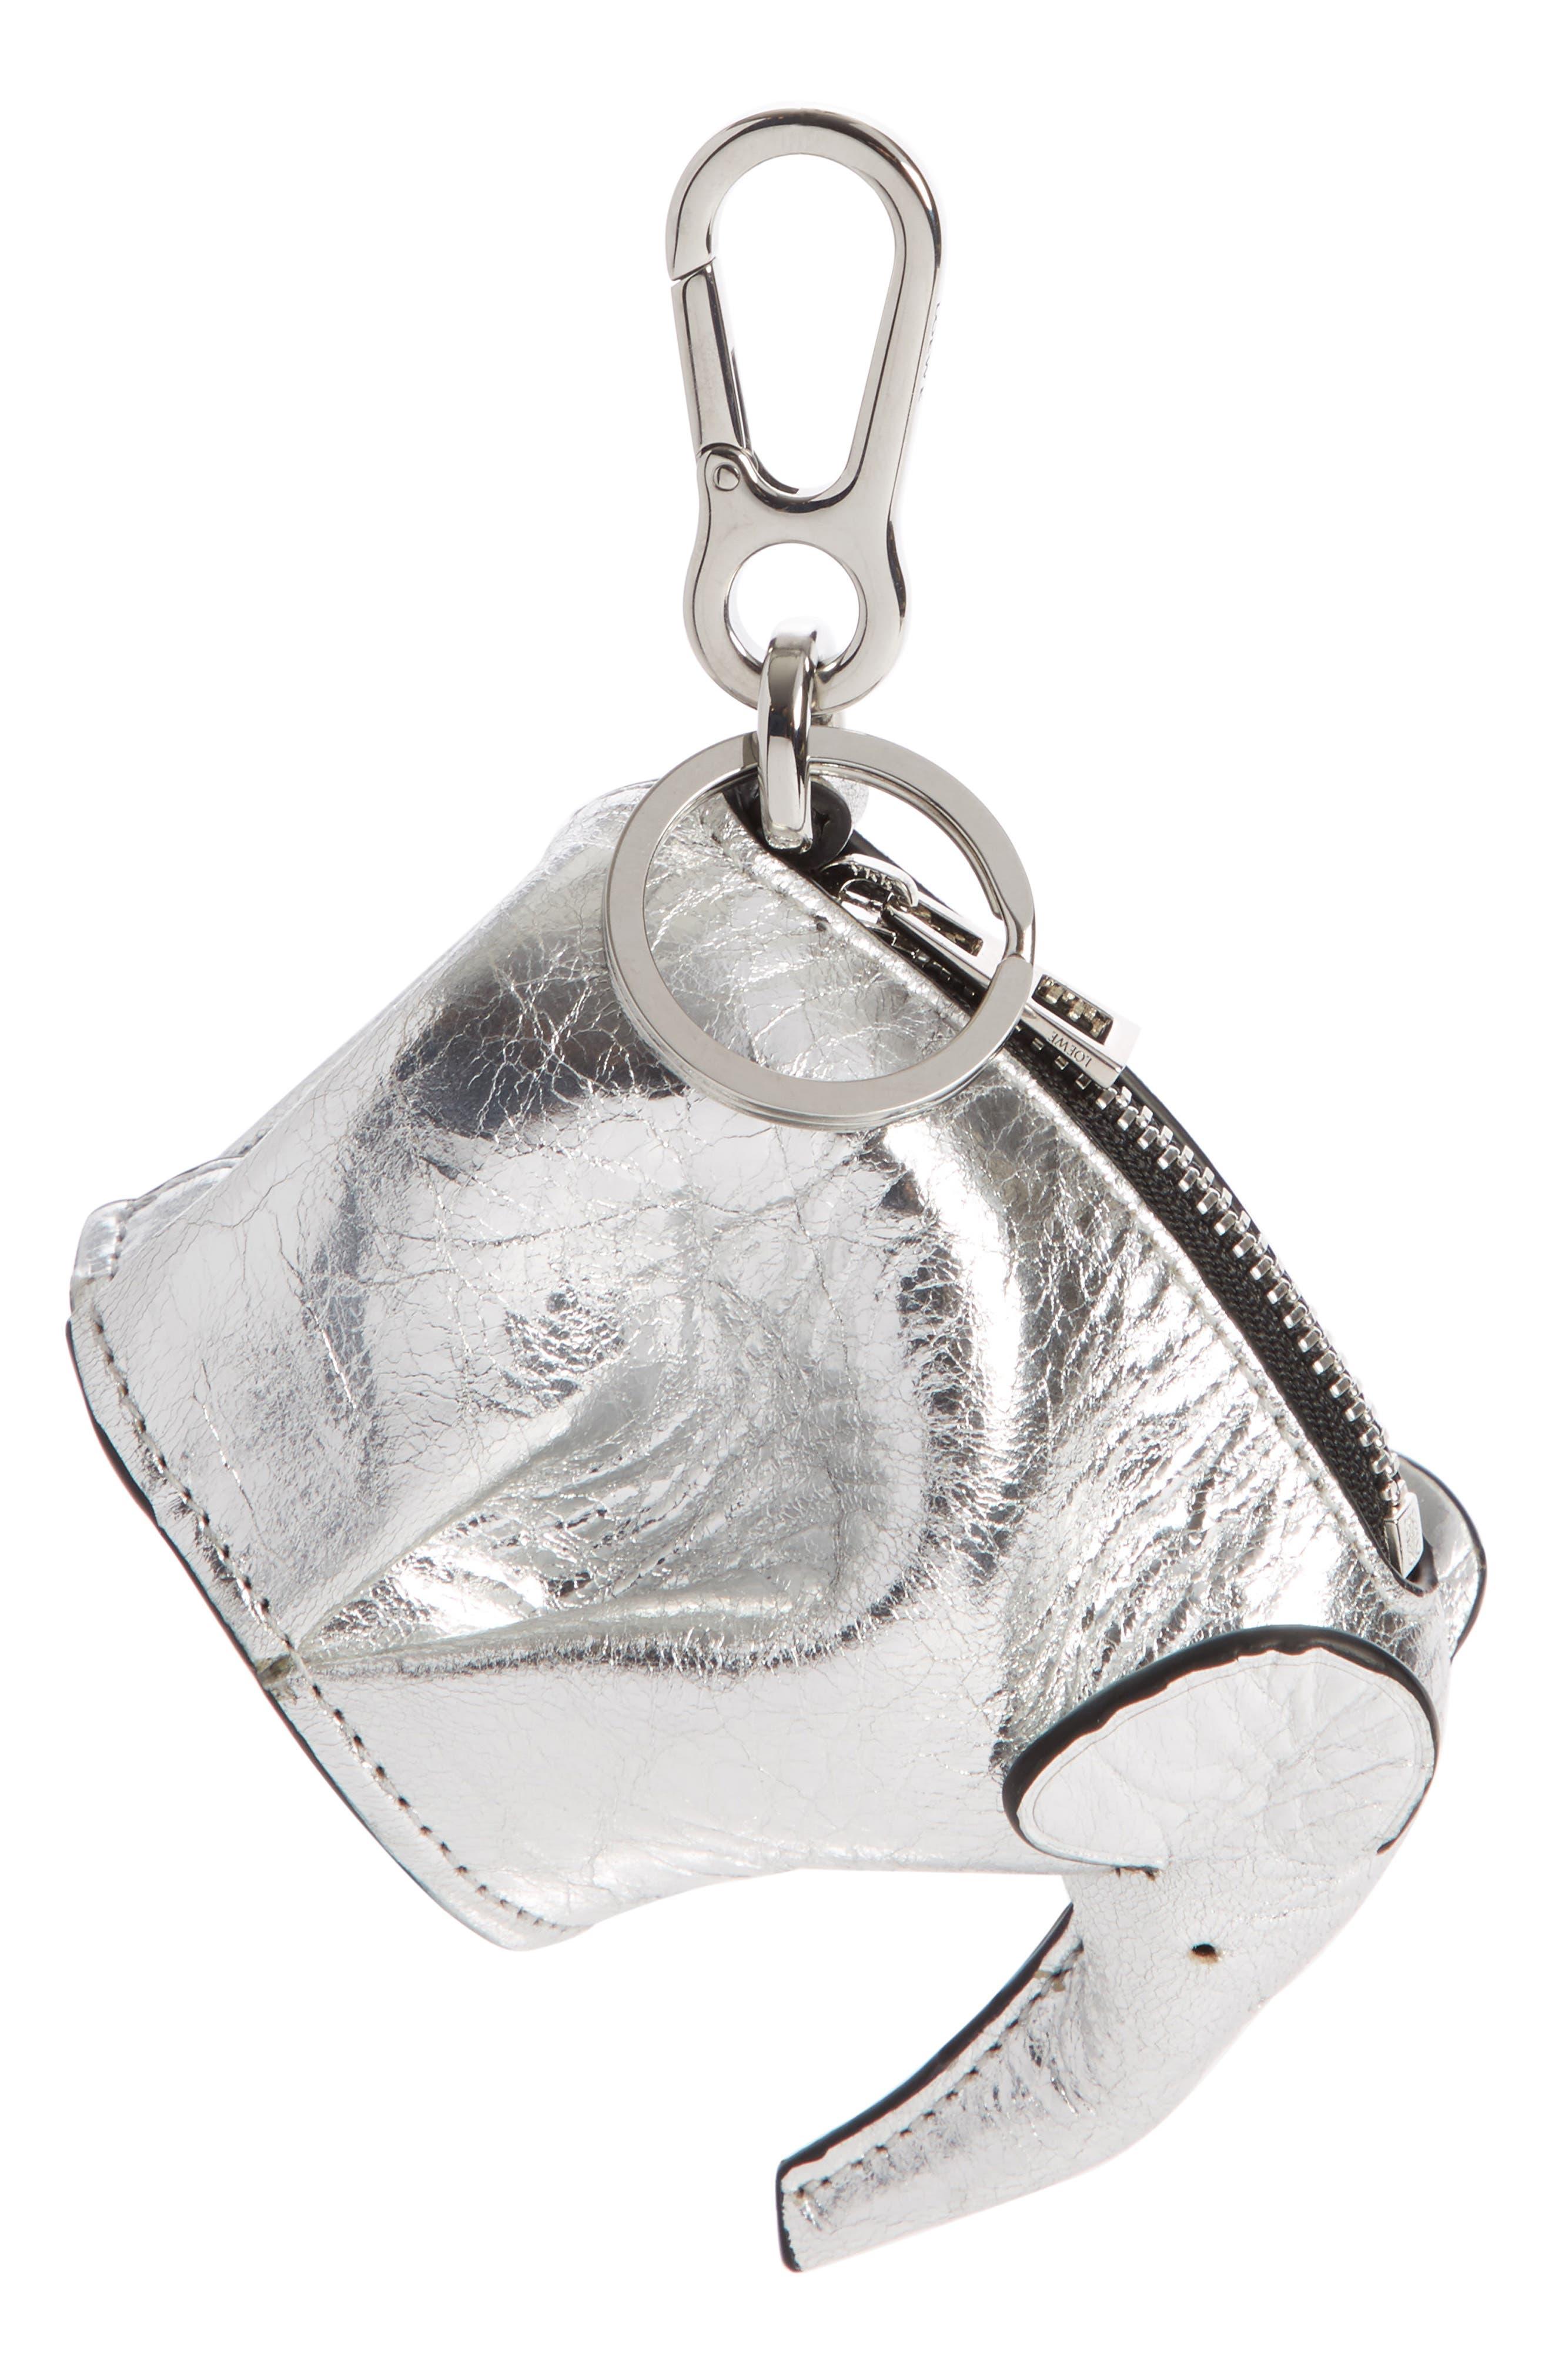 Elephant Metallic Leather Bag Charm,                             Main thumbnail 1, color,                             SILVER